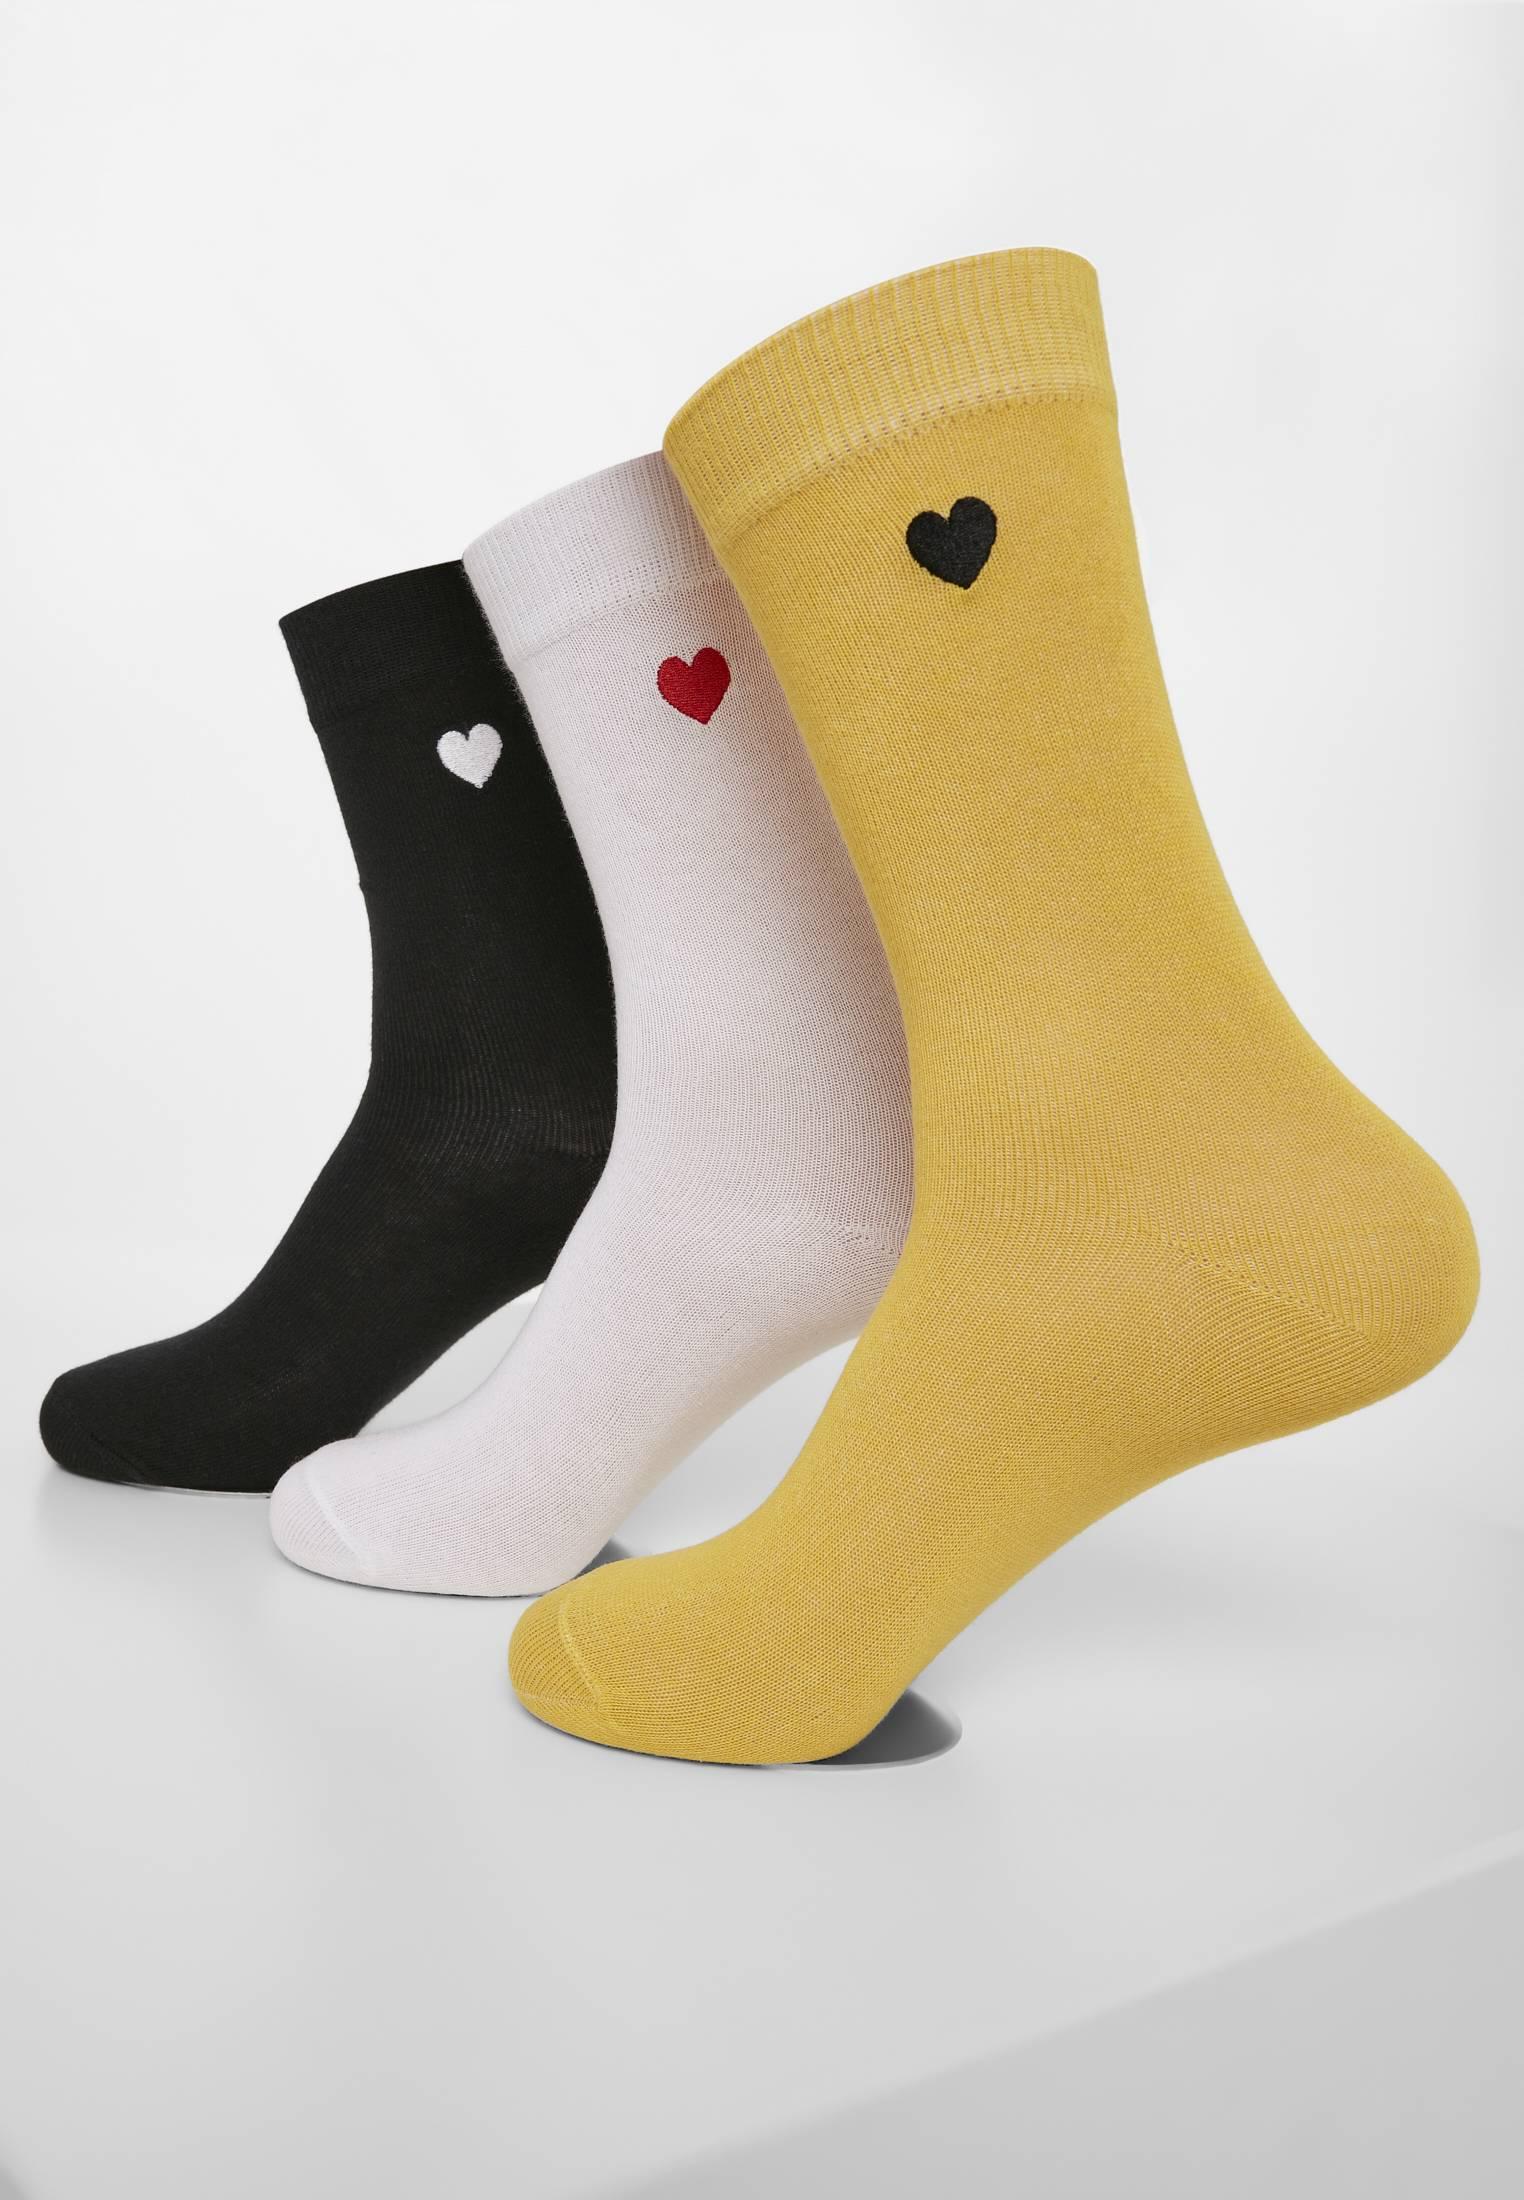 Urban Classics Heart Socks 3-Pack black/white/yellow - 39-42